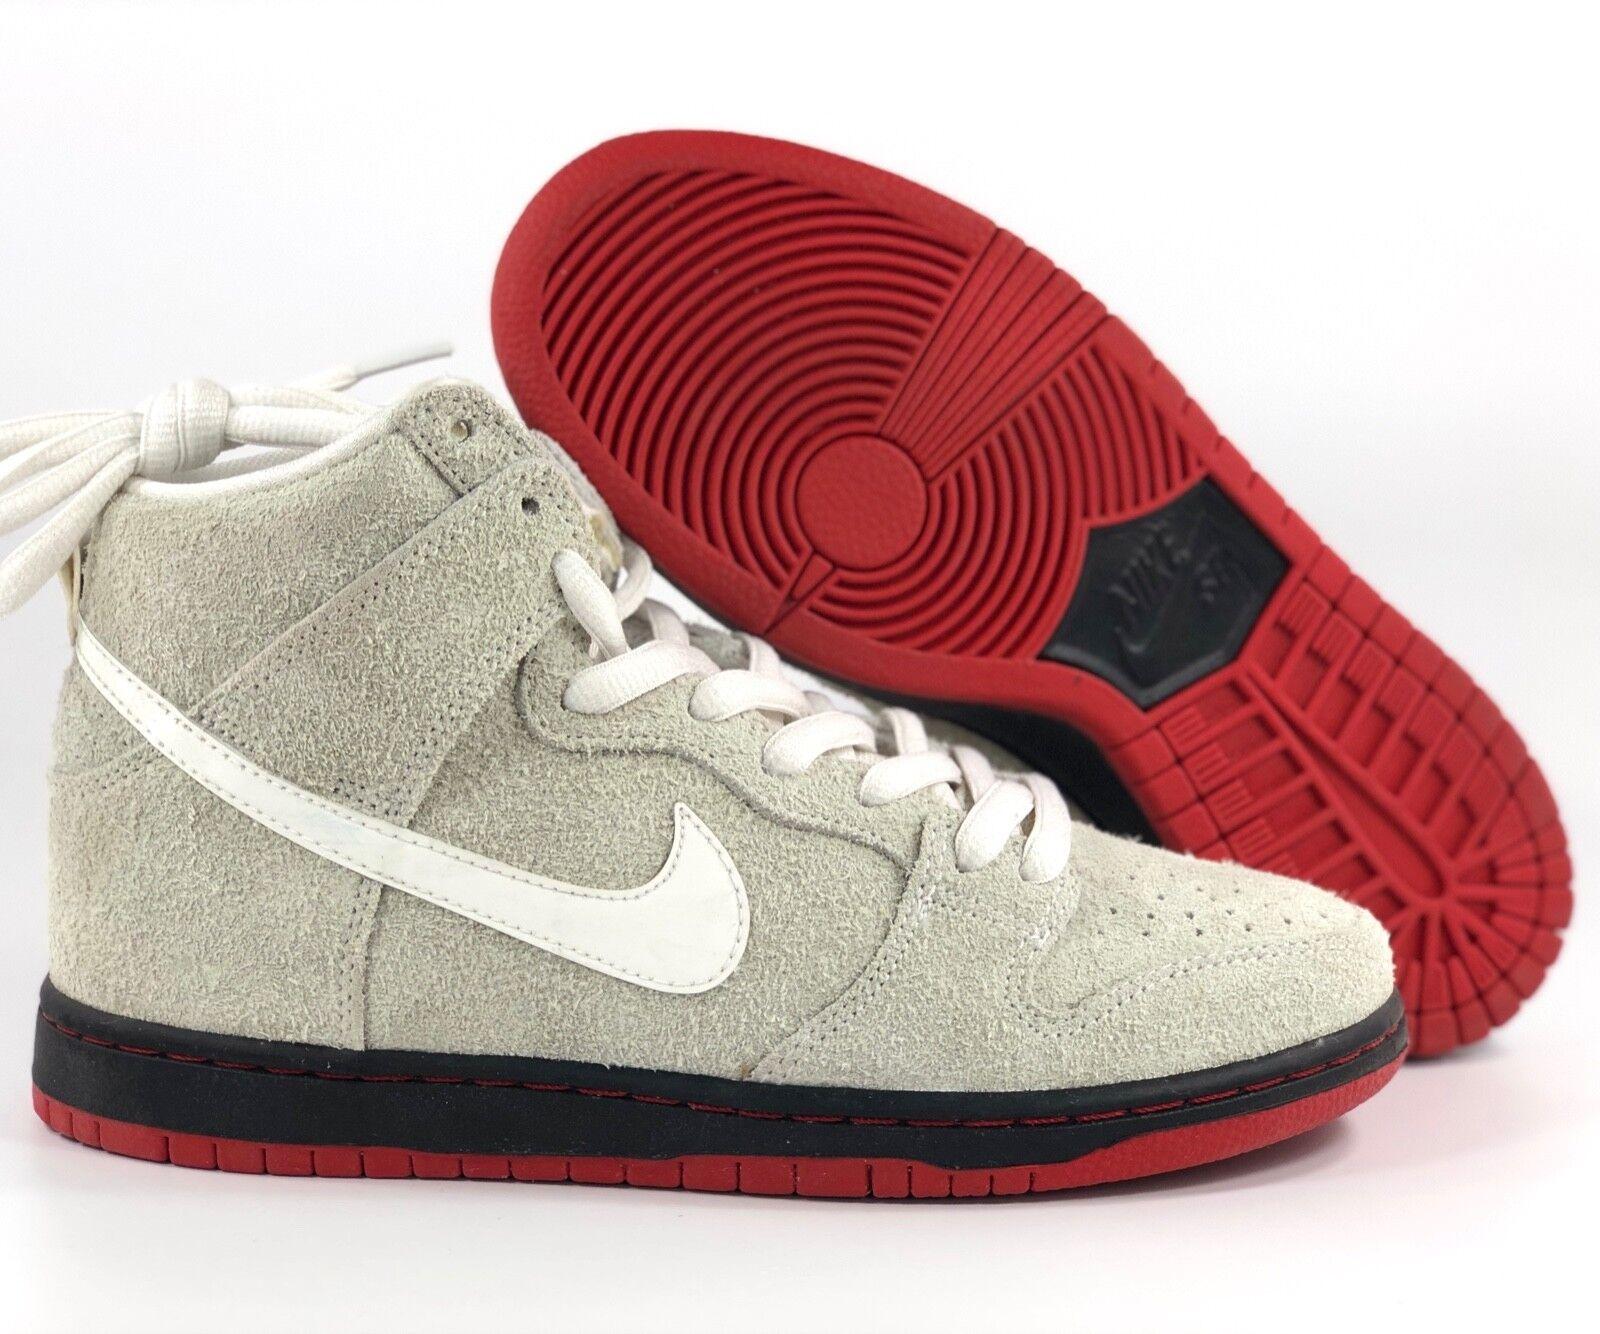 Nike SB Dunk High TRD QS Black Sheep Summit White Black Red 881758-110 Men's 11